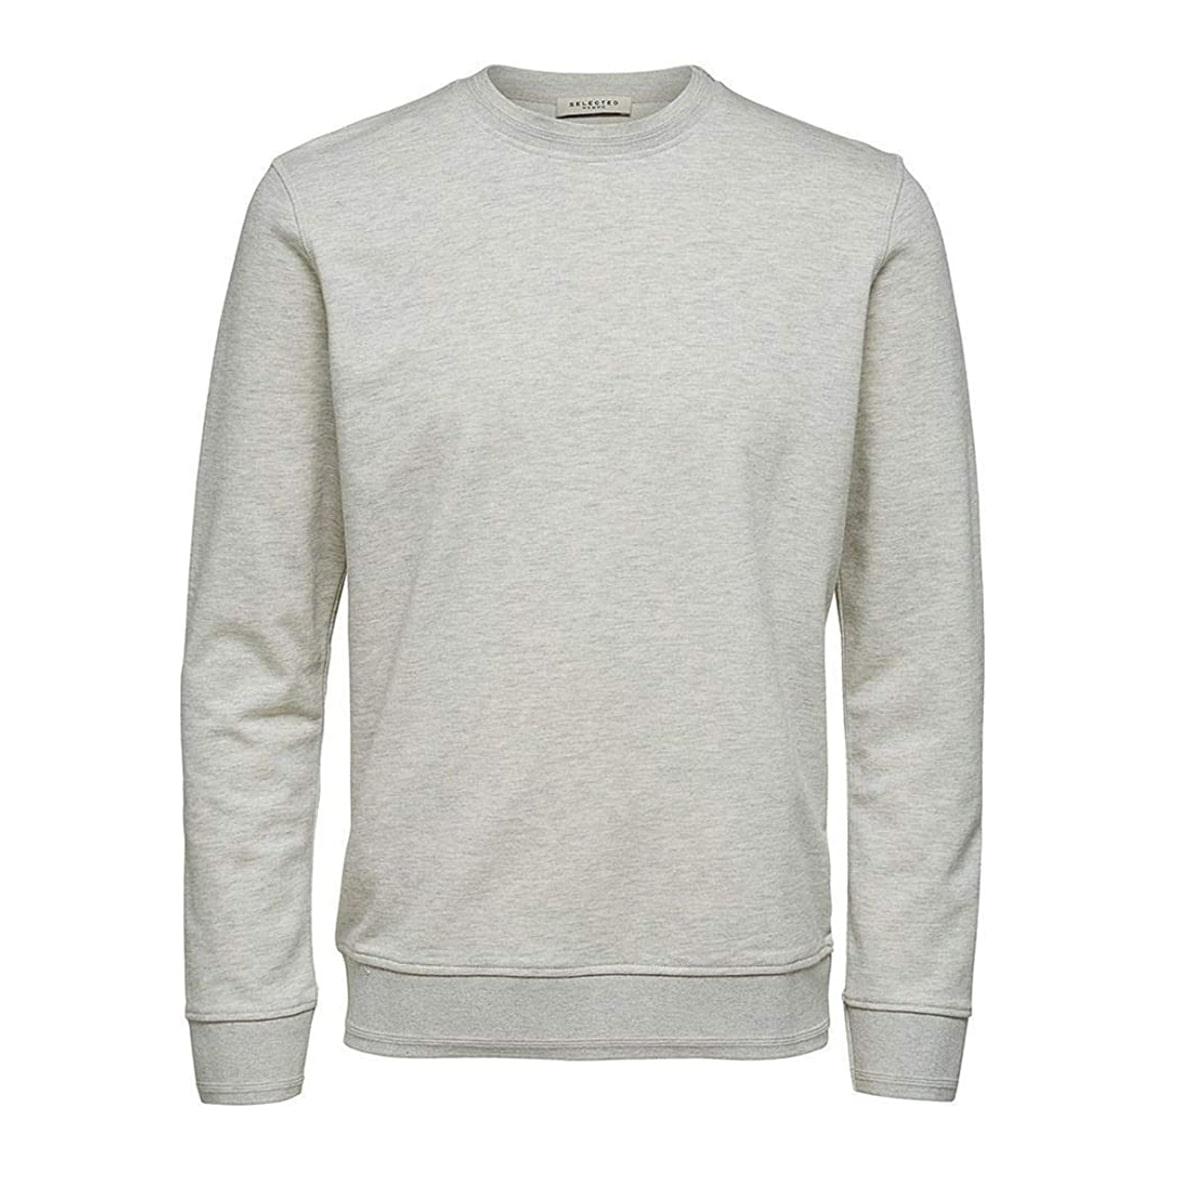 Bono Crewneck Sweater Egret Selected Homme | Restoration Yard